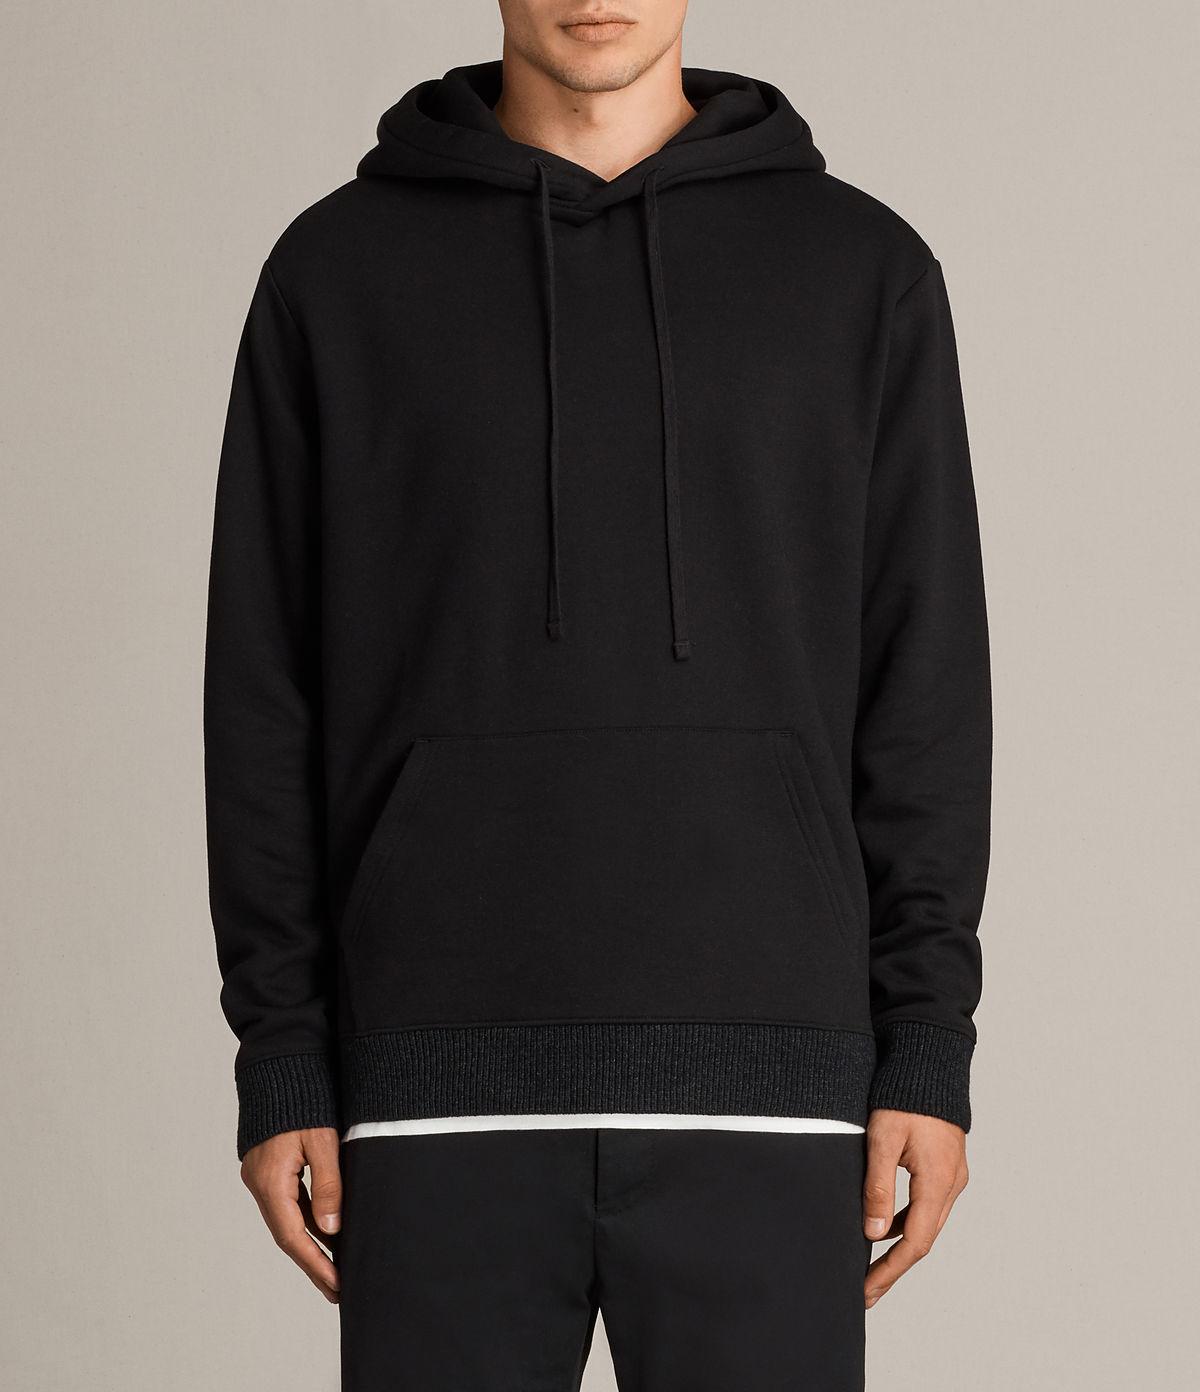 Sweatshirts Elders Oth Hoody